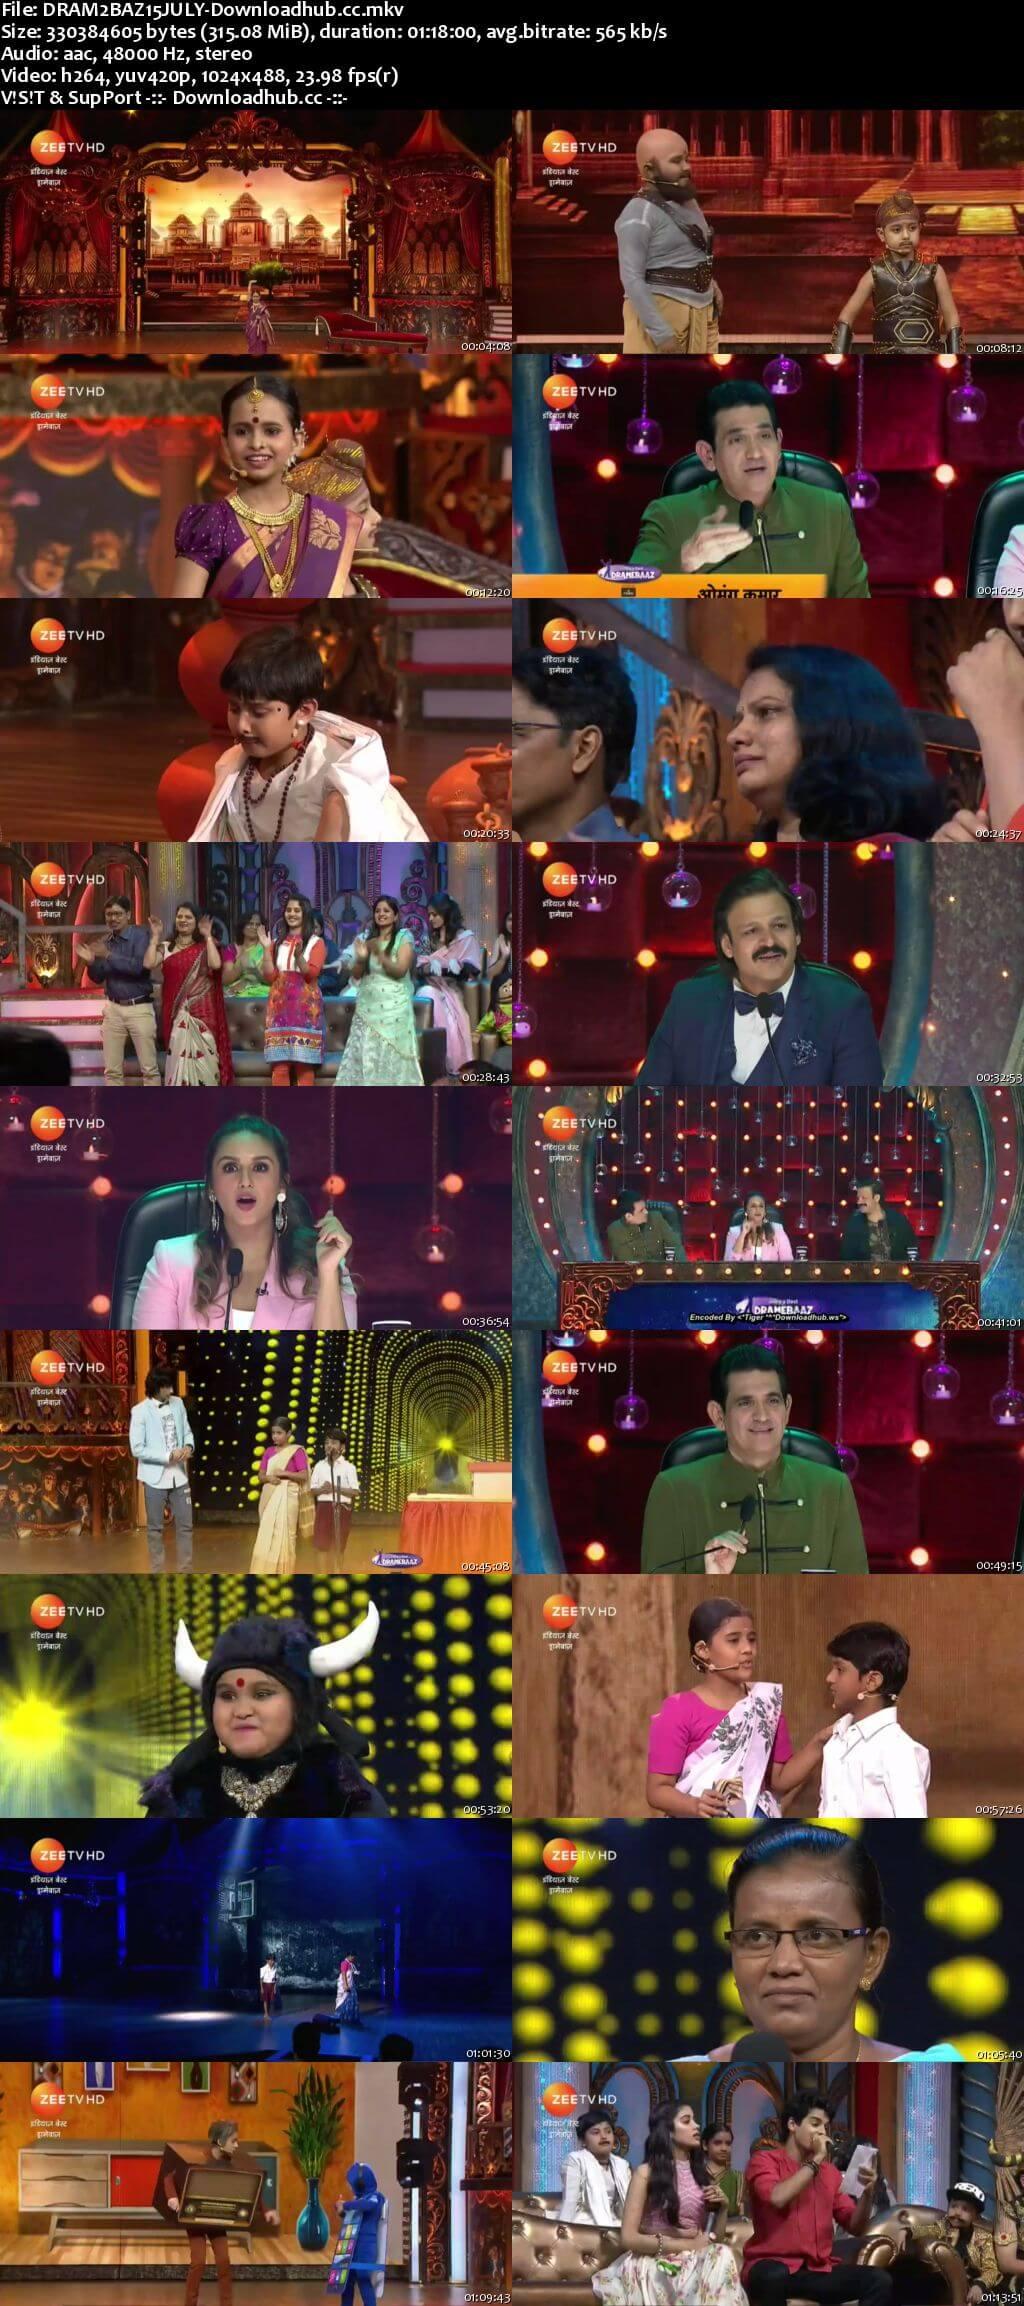 Indias Best Dramebaaz Season 3 15 July 2018 Episode 06 HDTV 480p